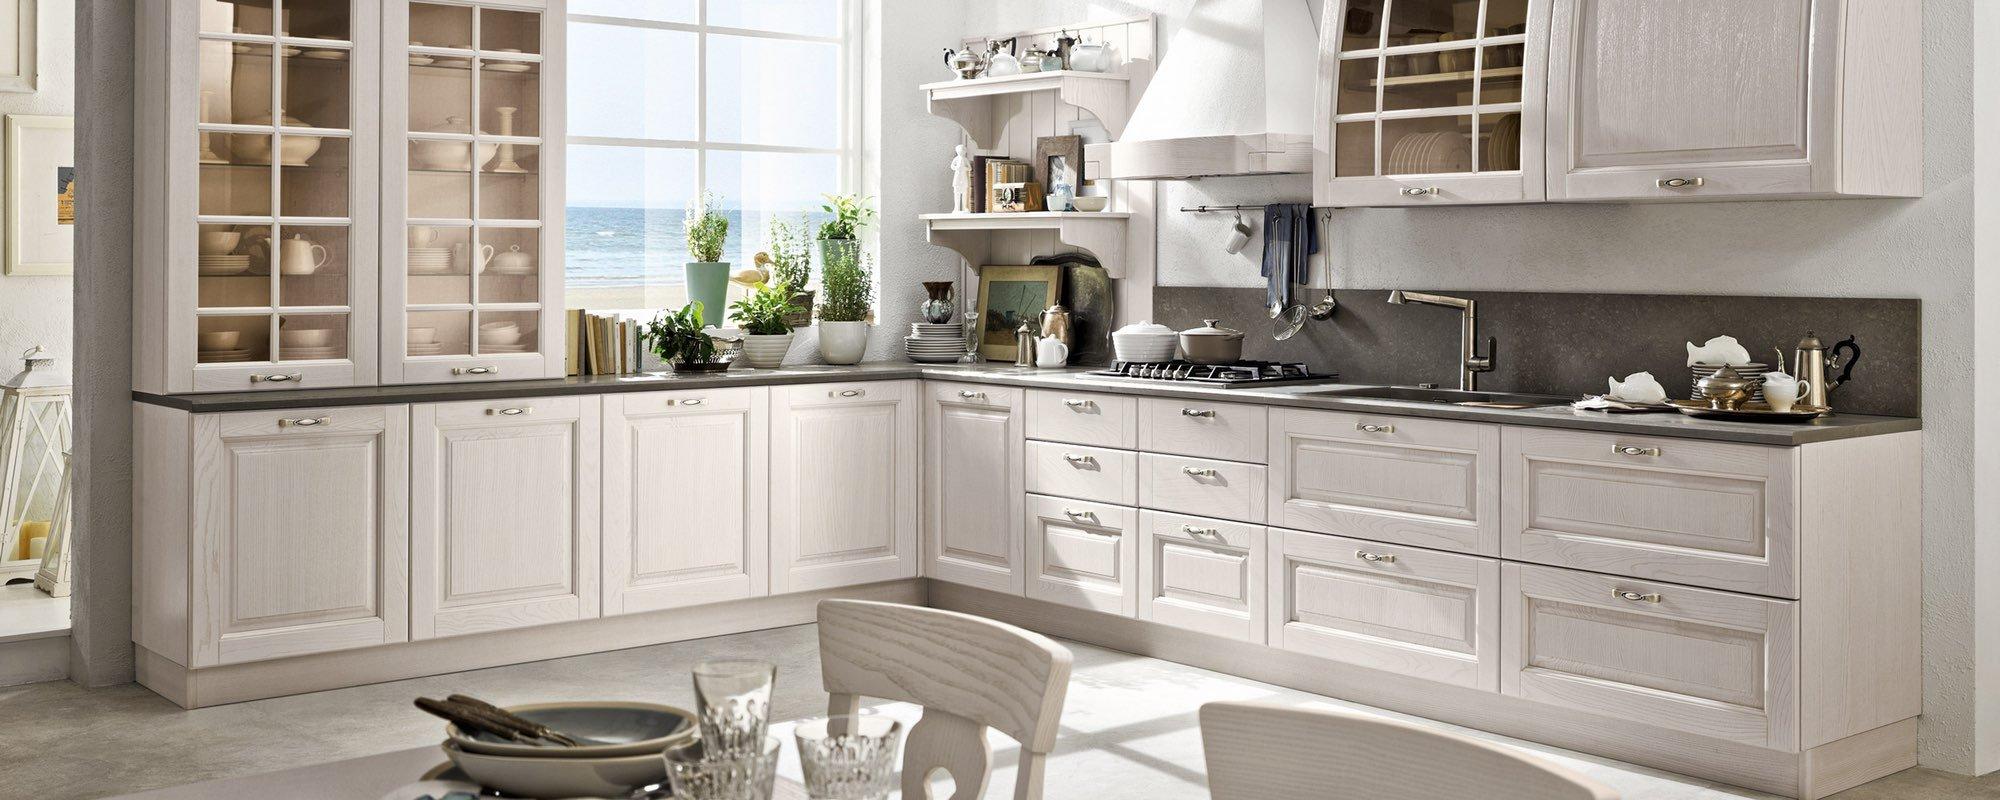 Stunning Cucina Classica Bianca Gallery - Home Ideas - tyger.us